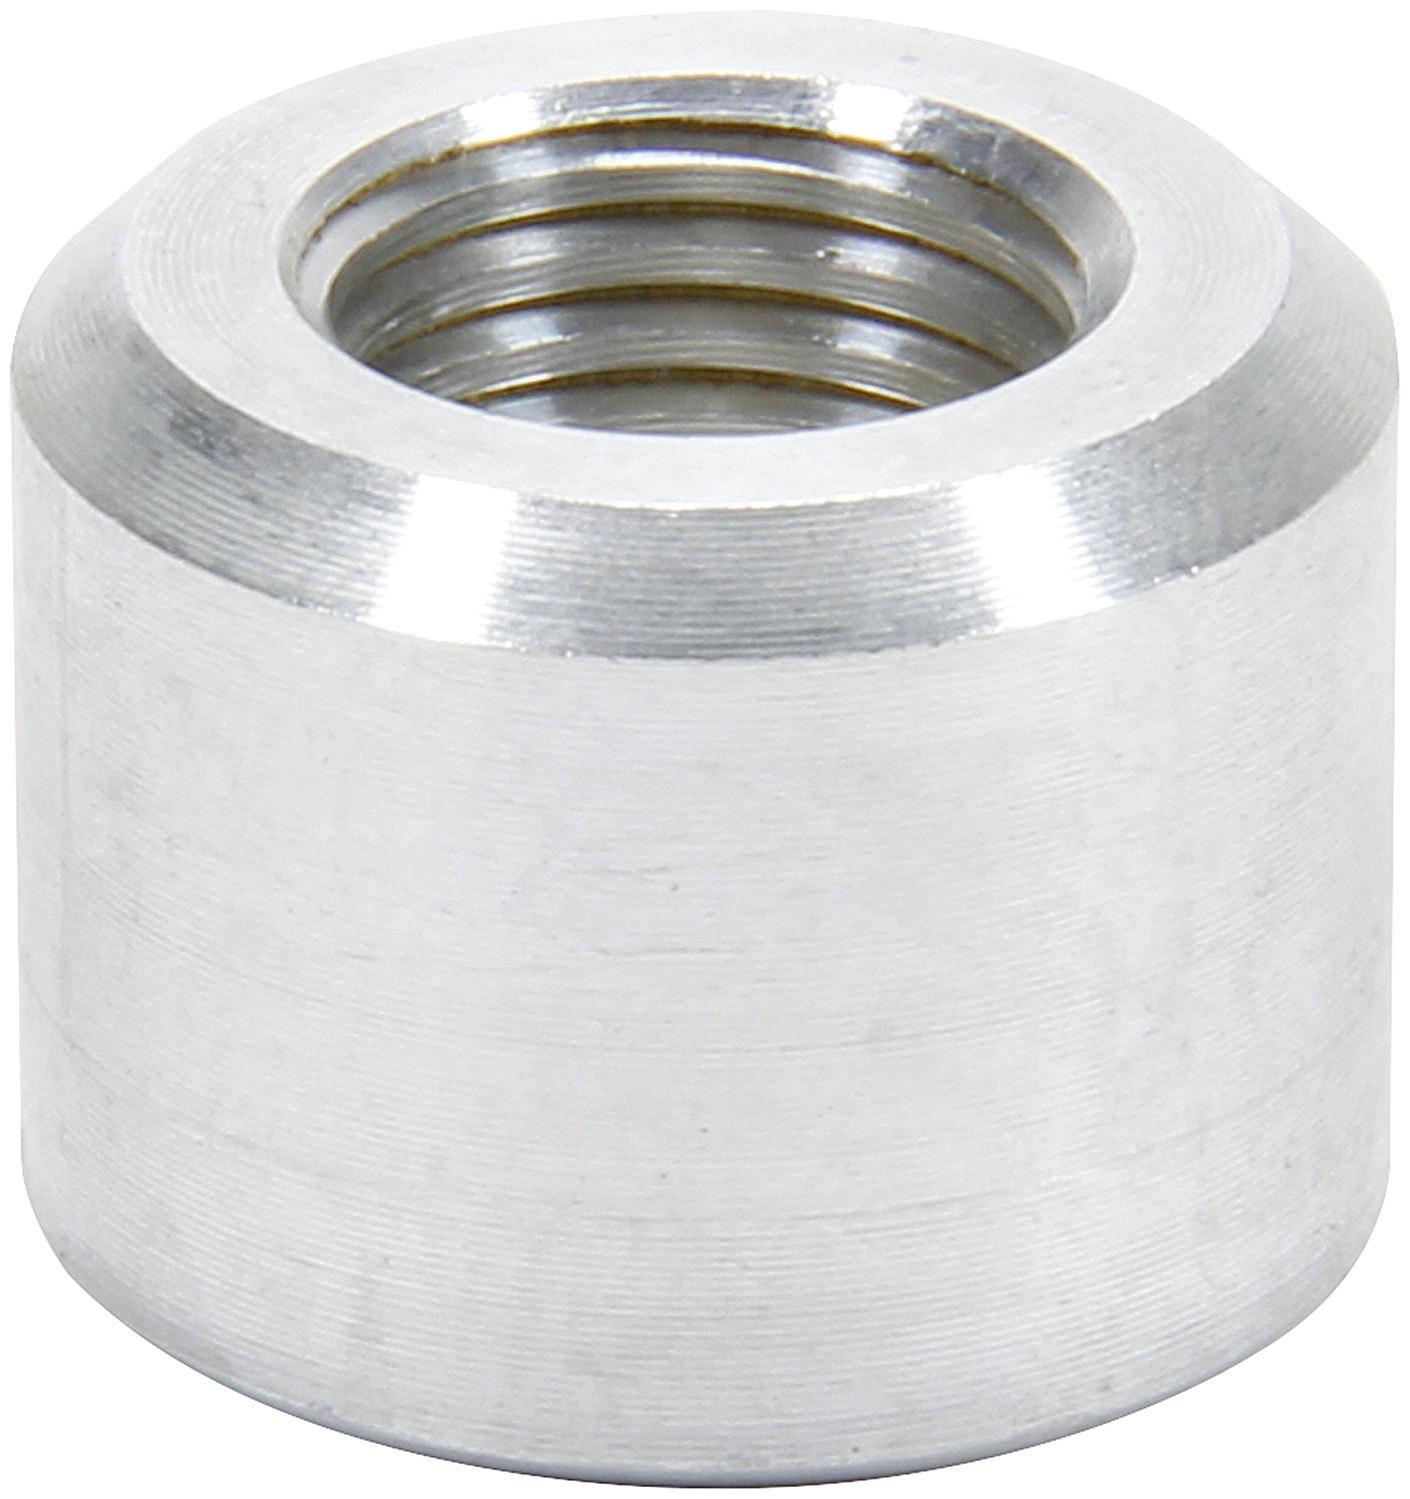 Allstar Performance 50782 Bung, 8 AN Female O-Ring, Weld-On, Aluminum, Natural, Each